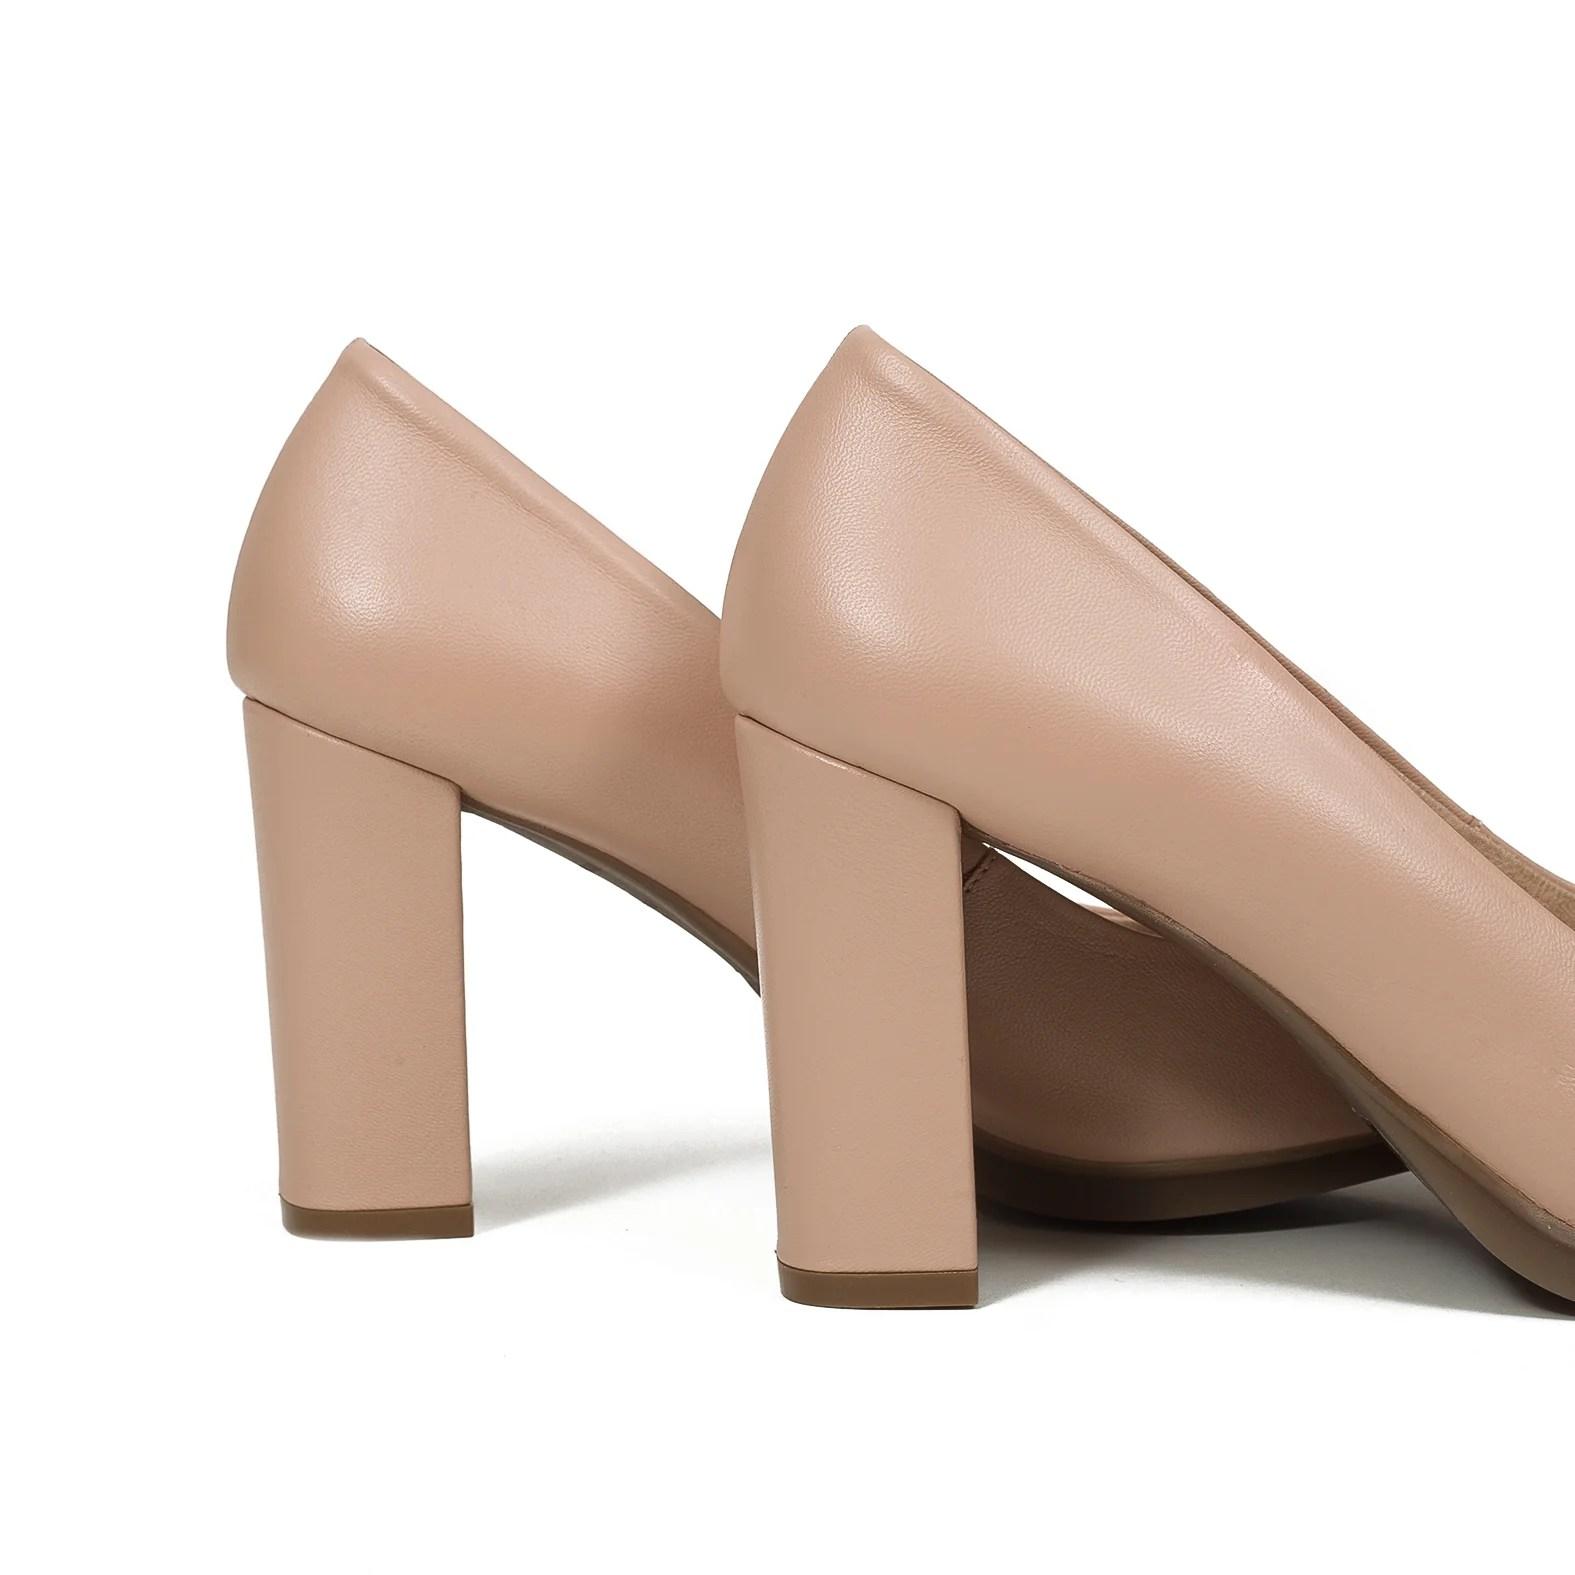 d07d9e5c Zapatos Salones | Nero Giardini Zapatos Online A719100d Negro Piel ...